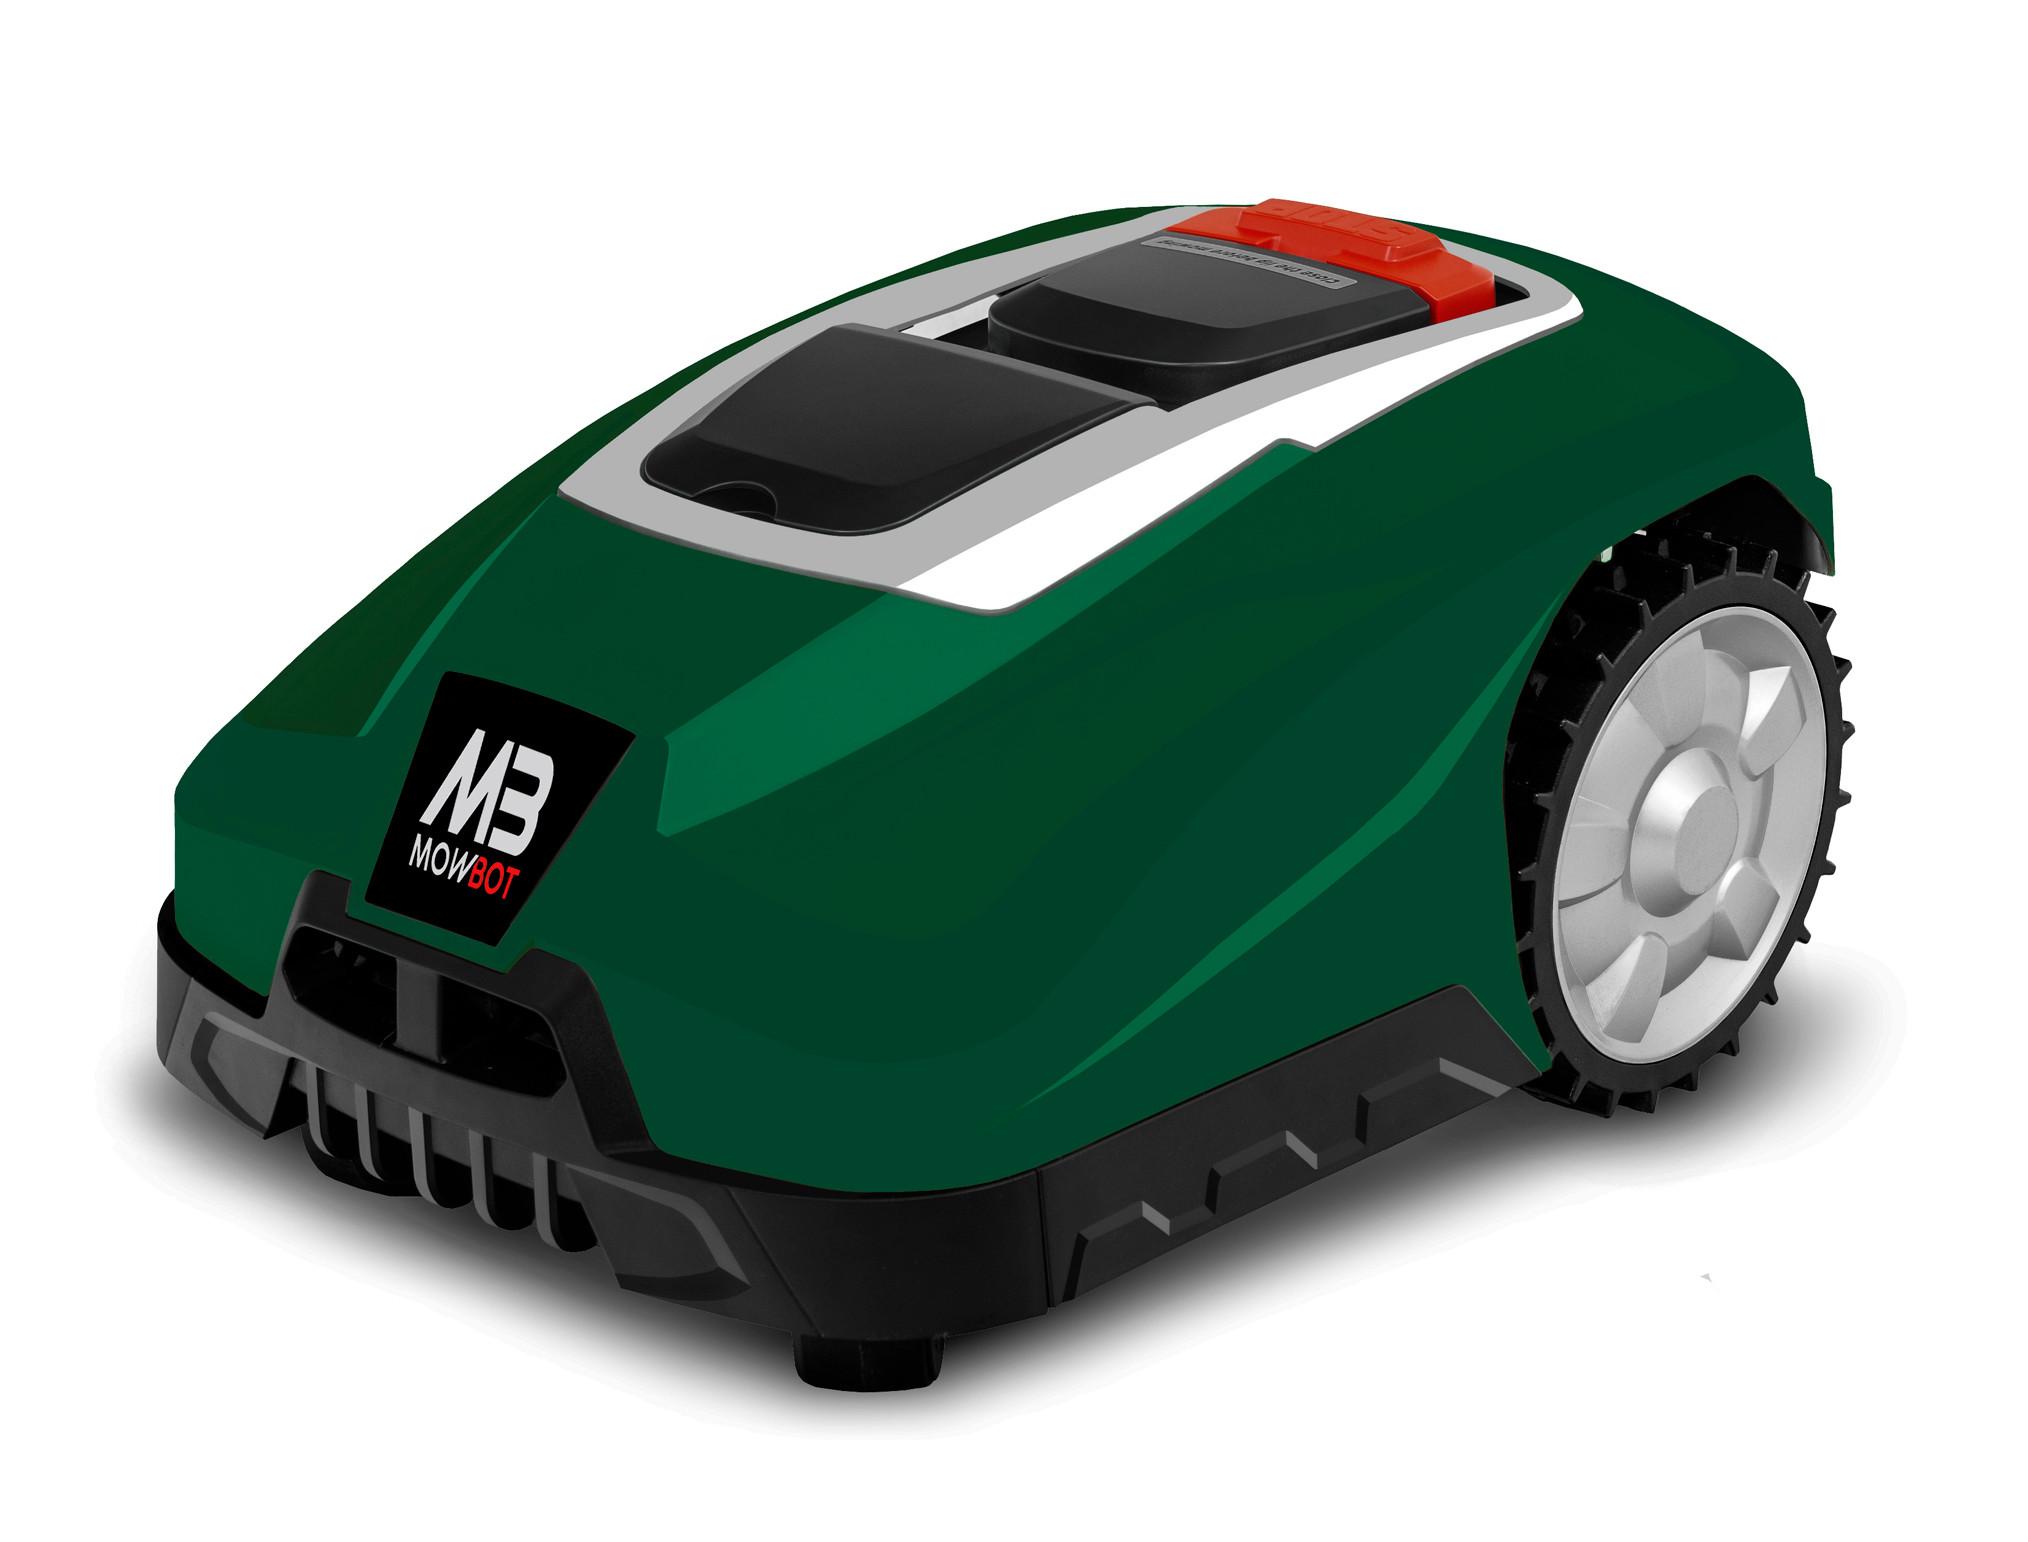 Mowbot 800SG Solid Green 800sq/m Robotic Mower